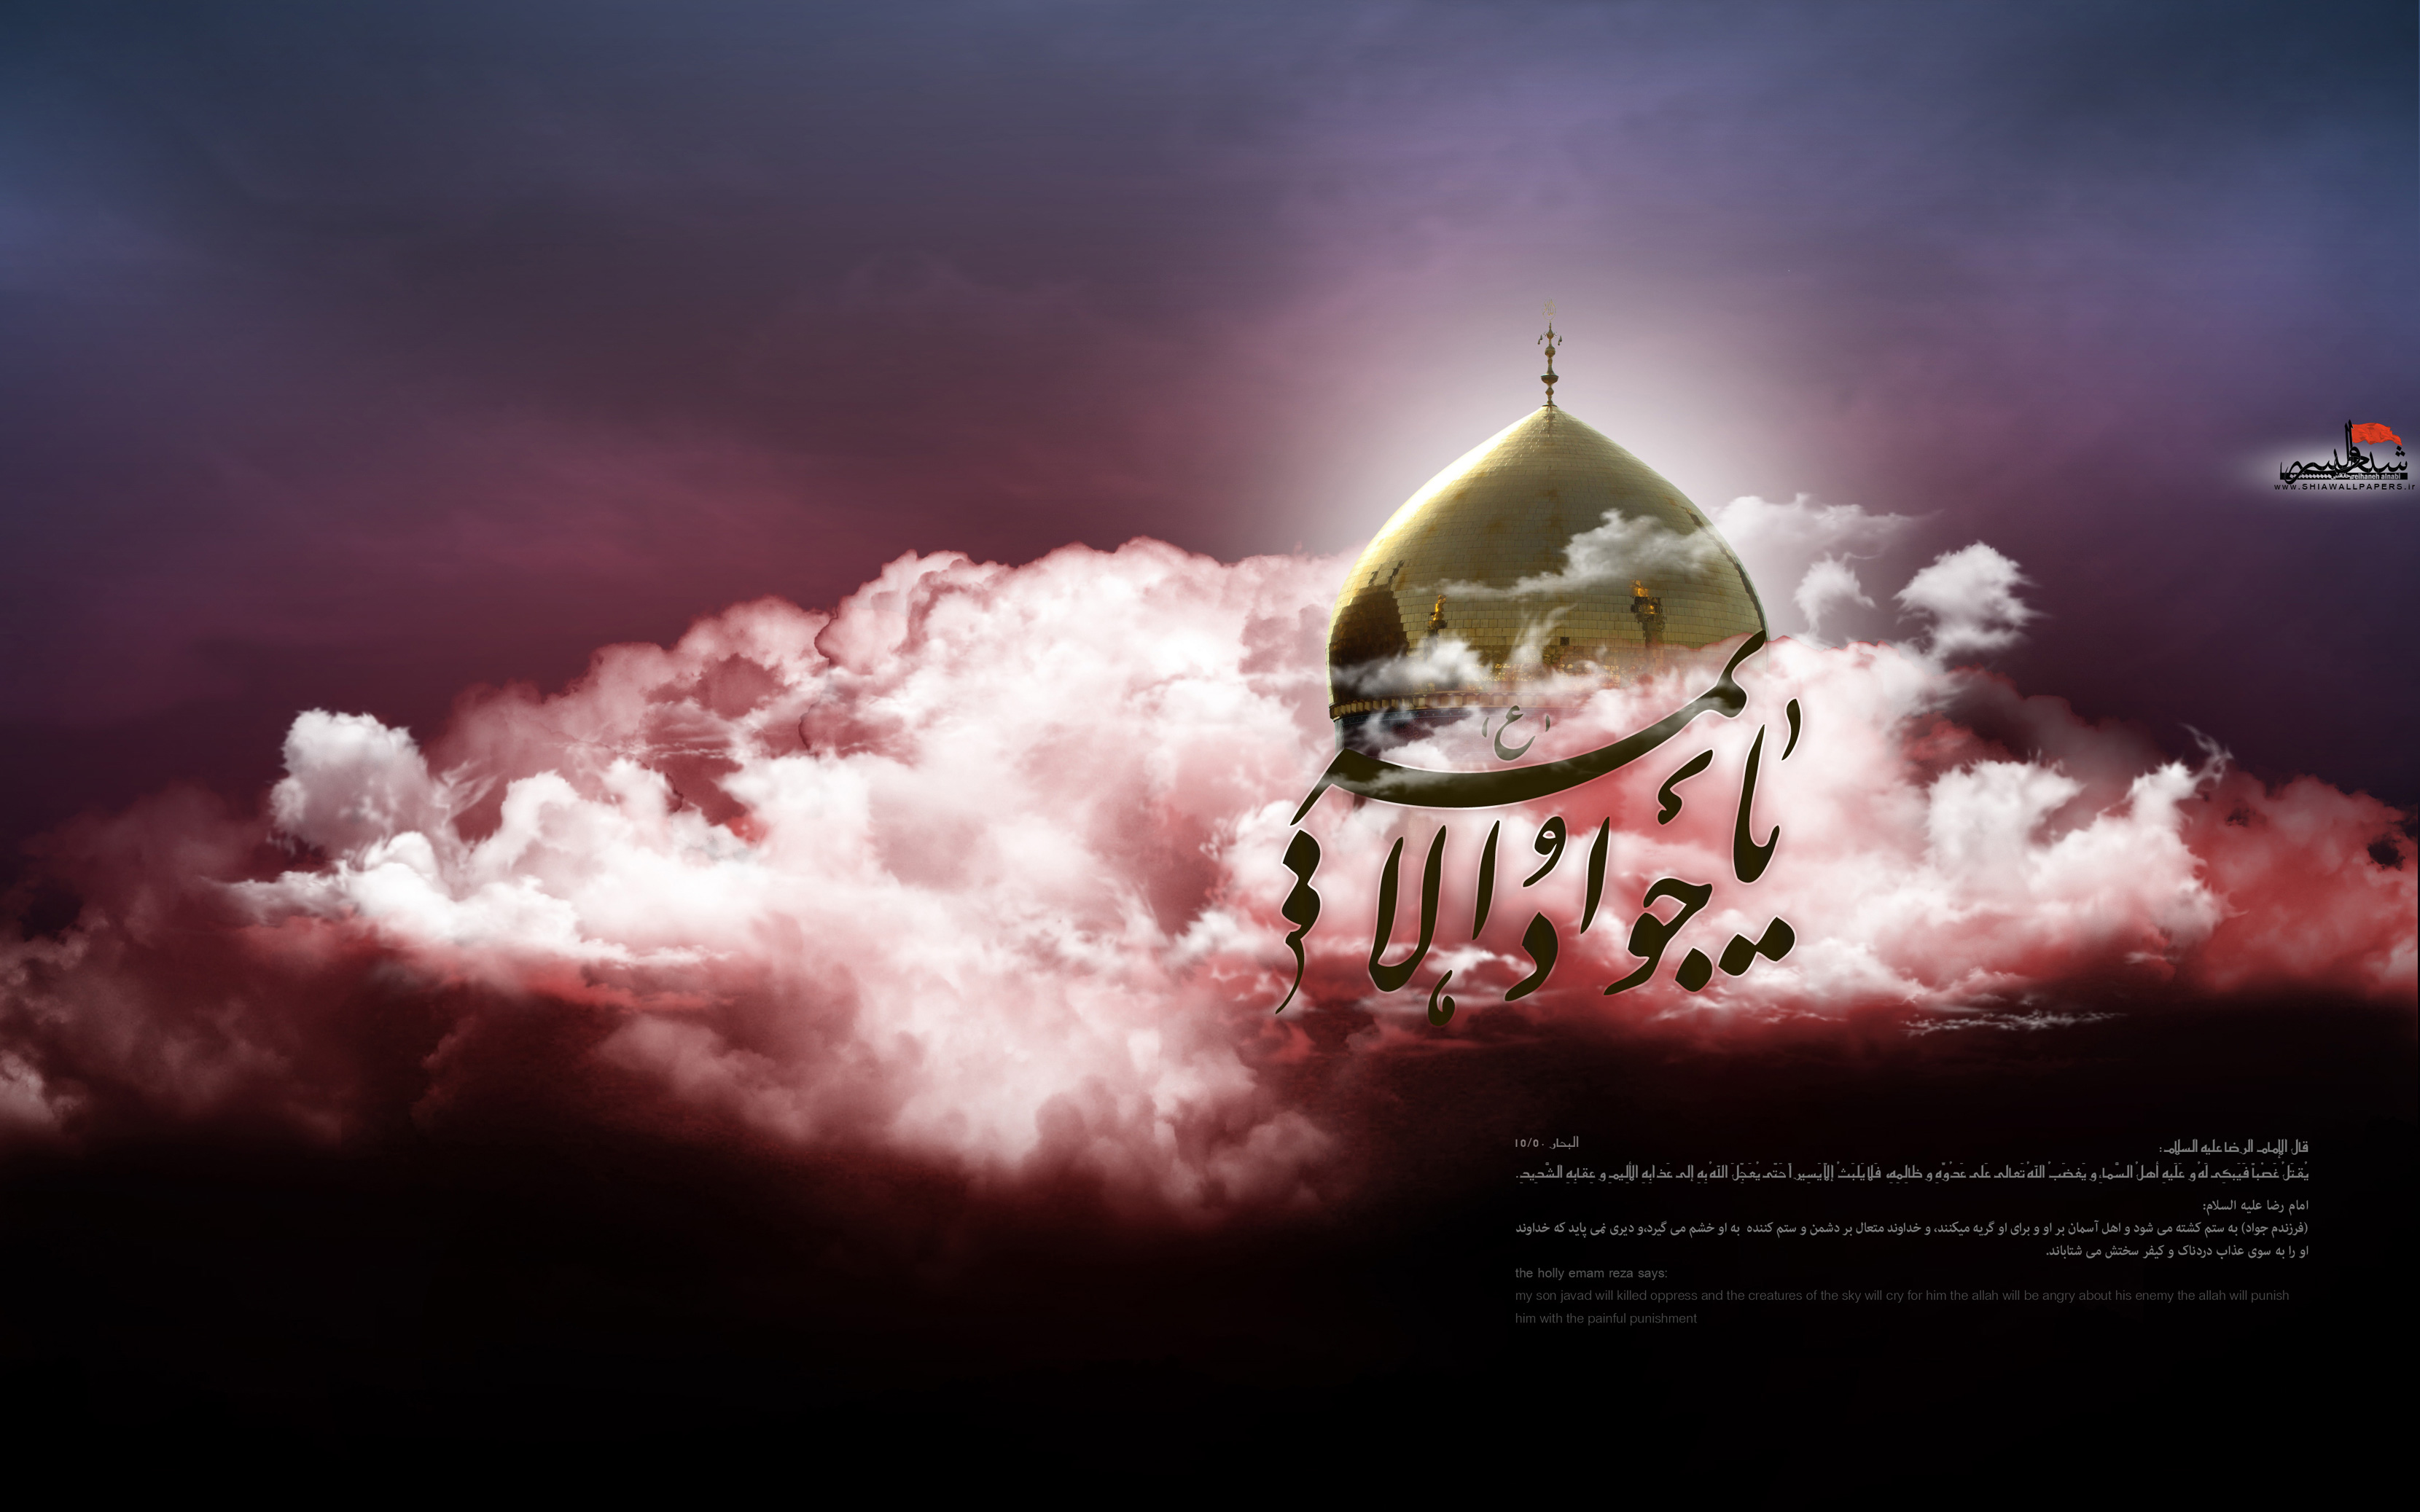 imam-javad-by-shiawallpapers__wwwshiapicsir_20101111_1943271465